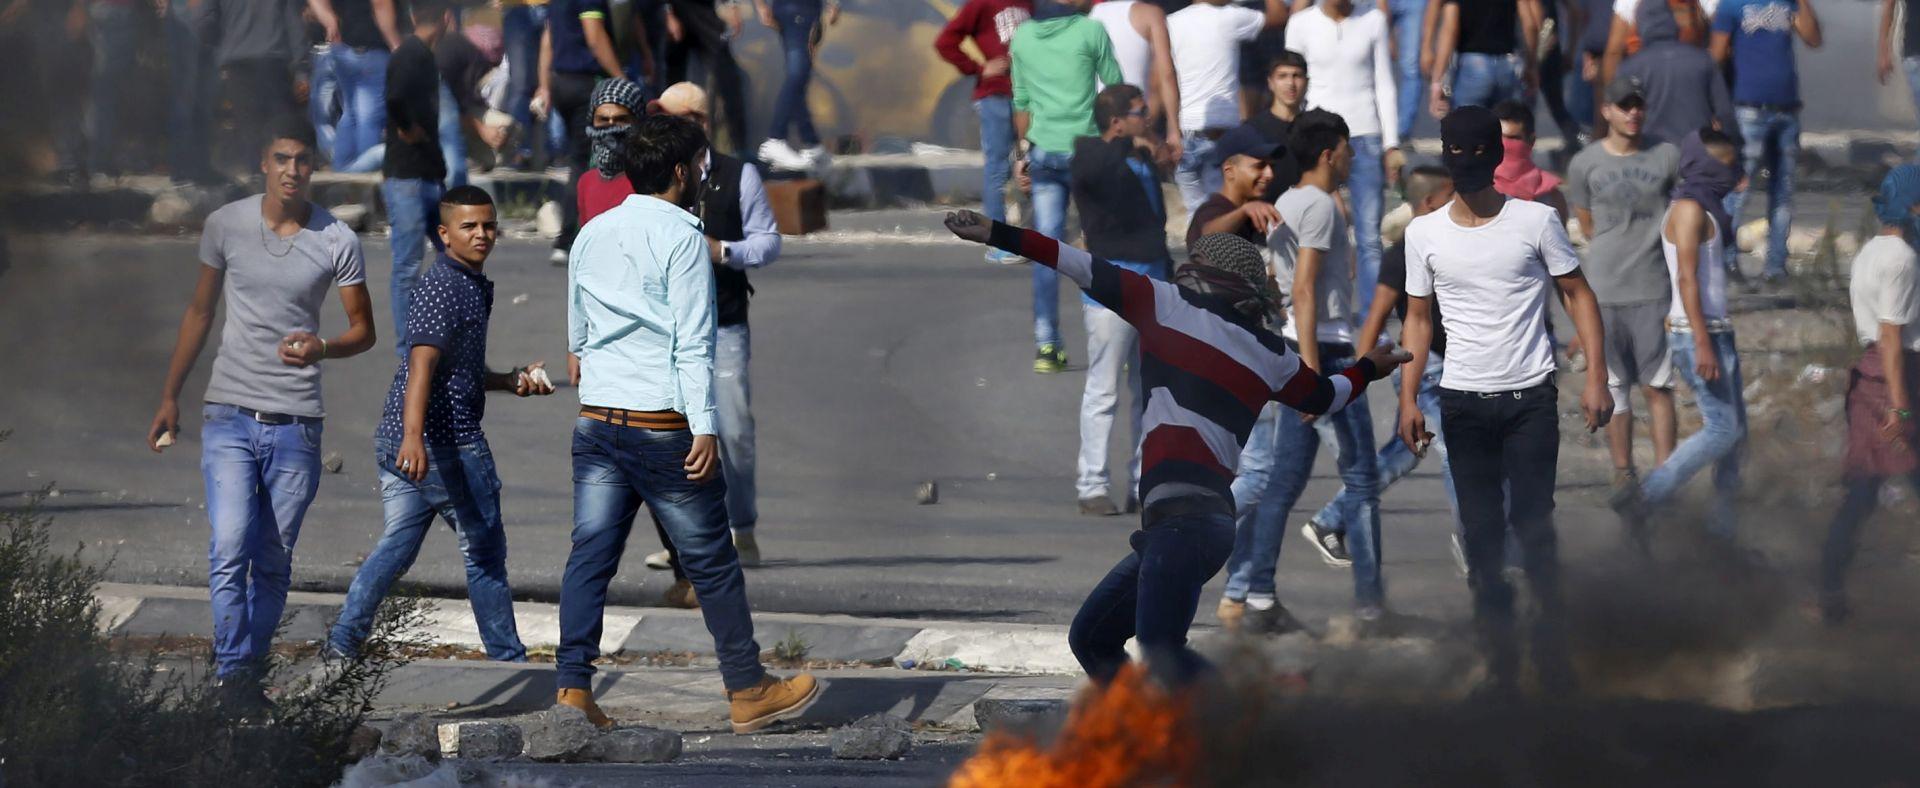 VAL NASILJA: Kerry pozvao na prekid izraelsko-palestinskih sukoba